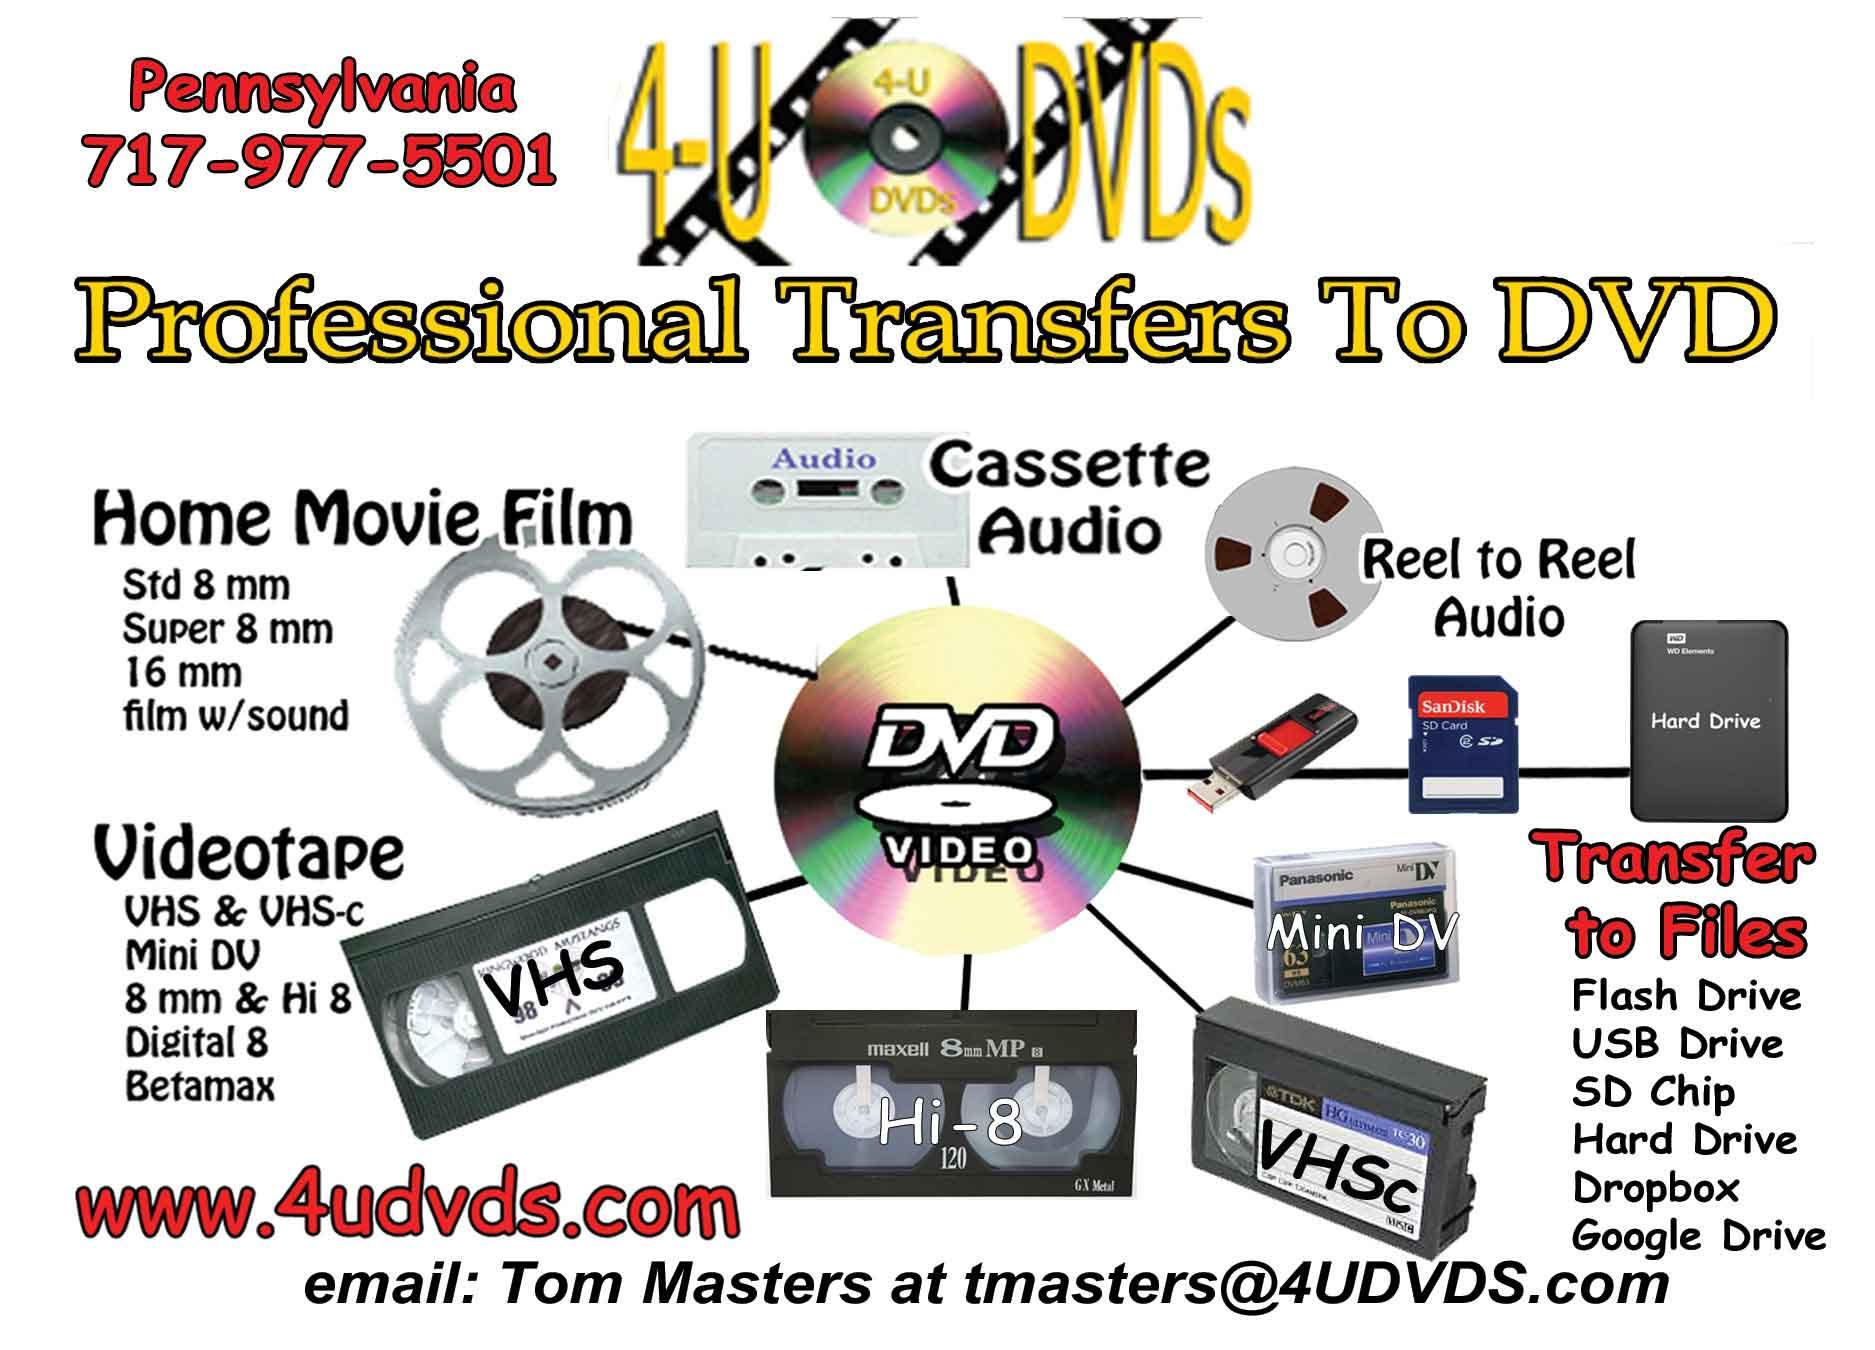 4udvds Film Transfer Converting Vhs To Dvd Cd Duplication Pennsylvania